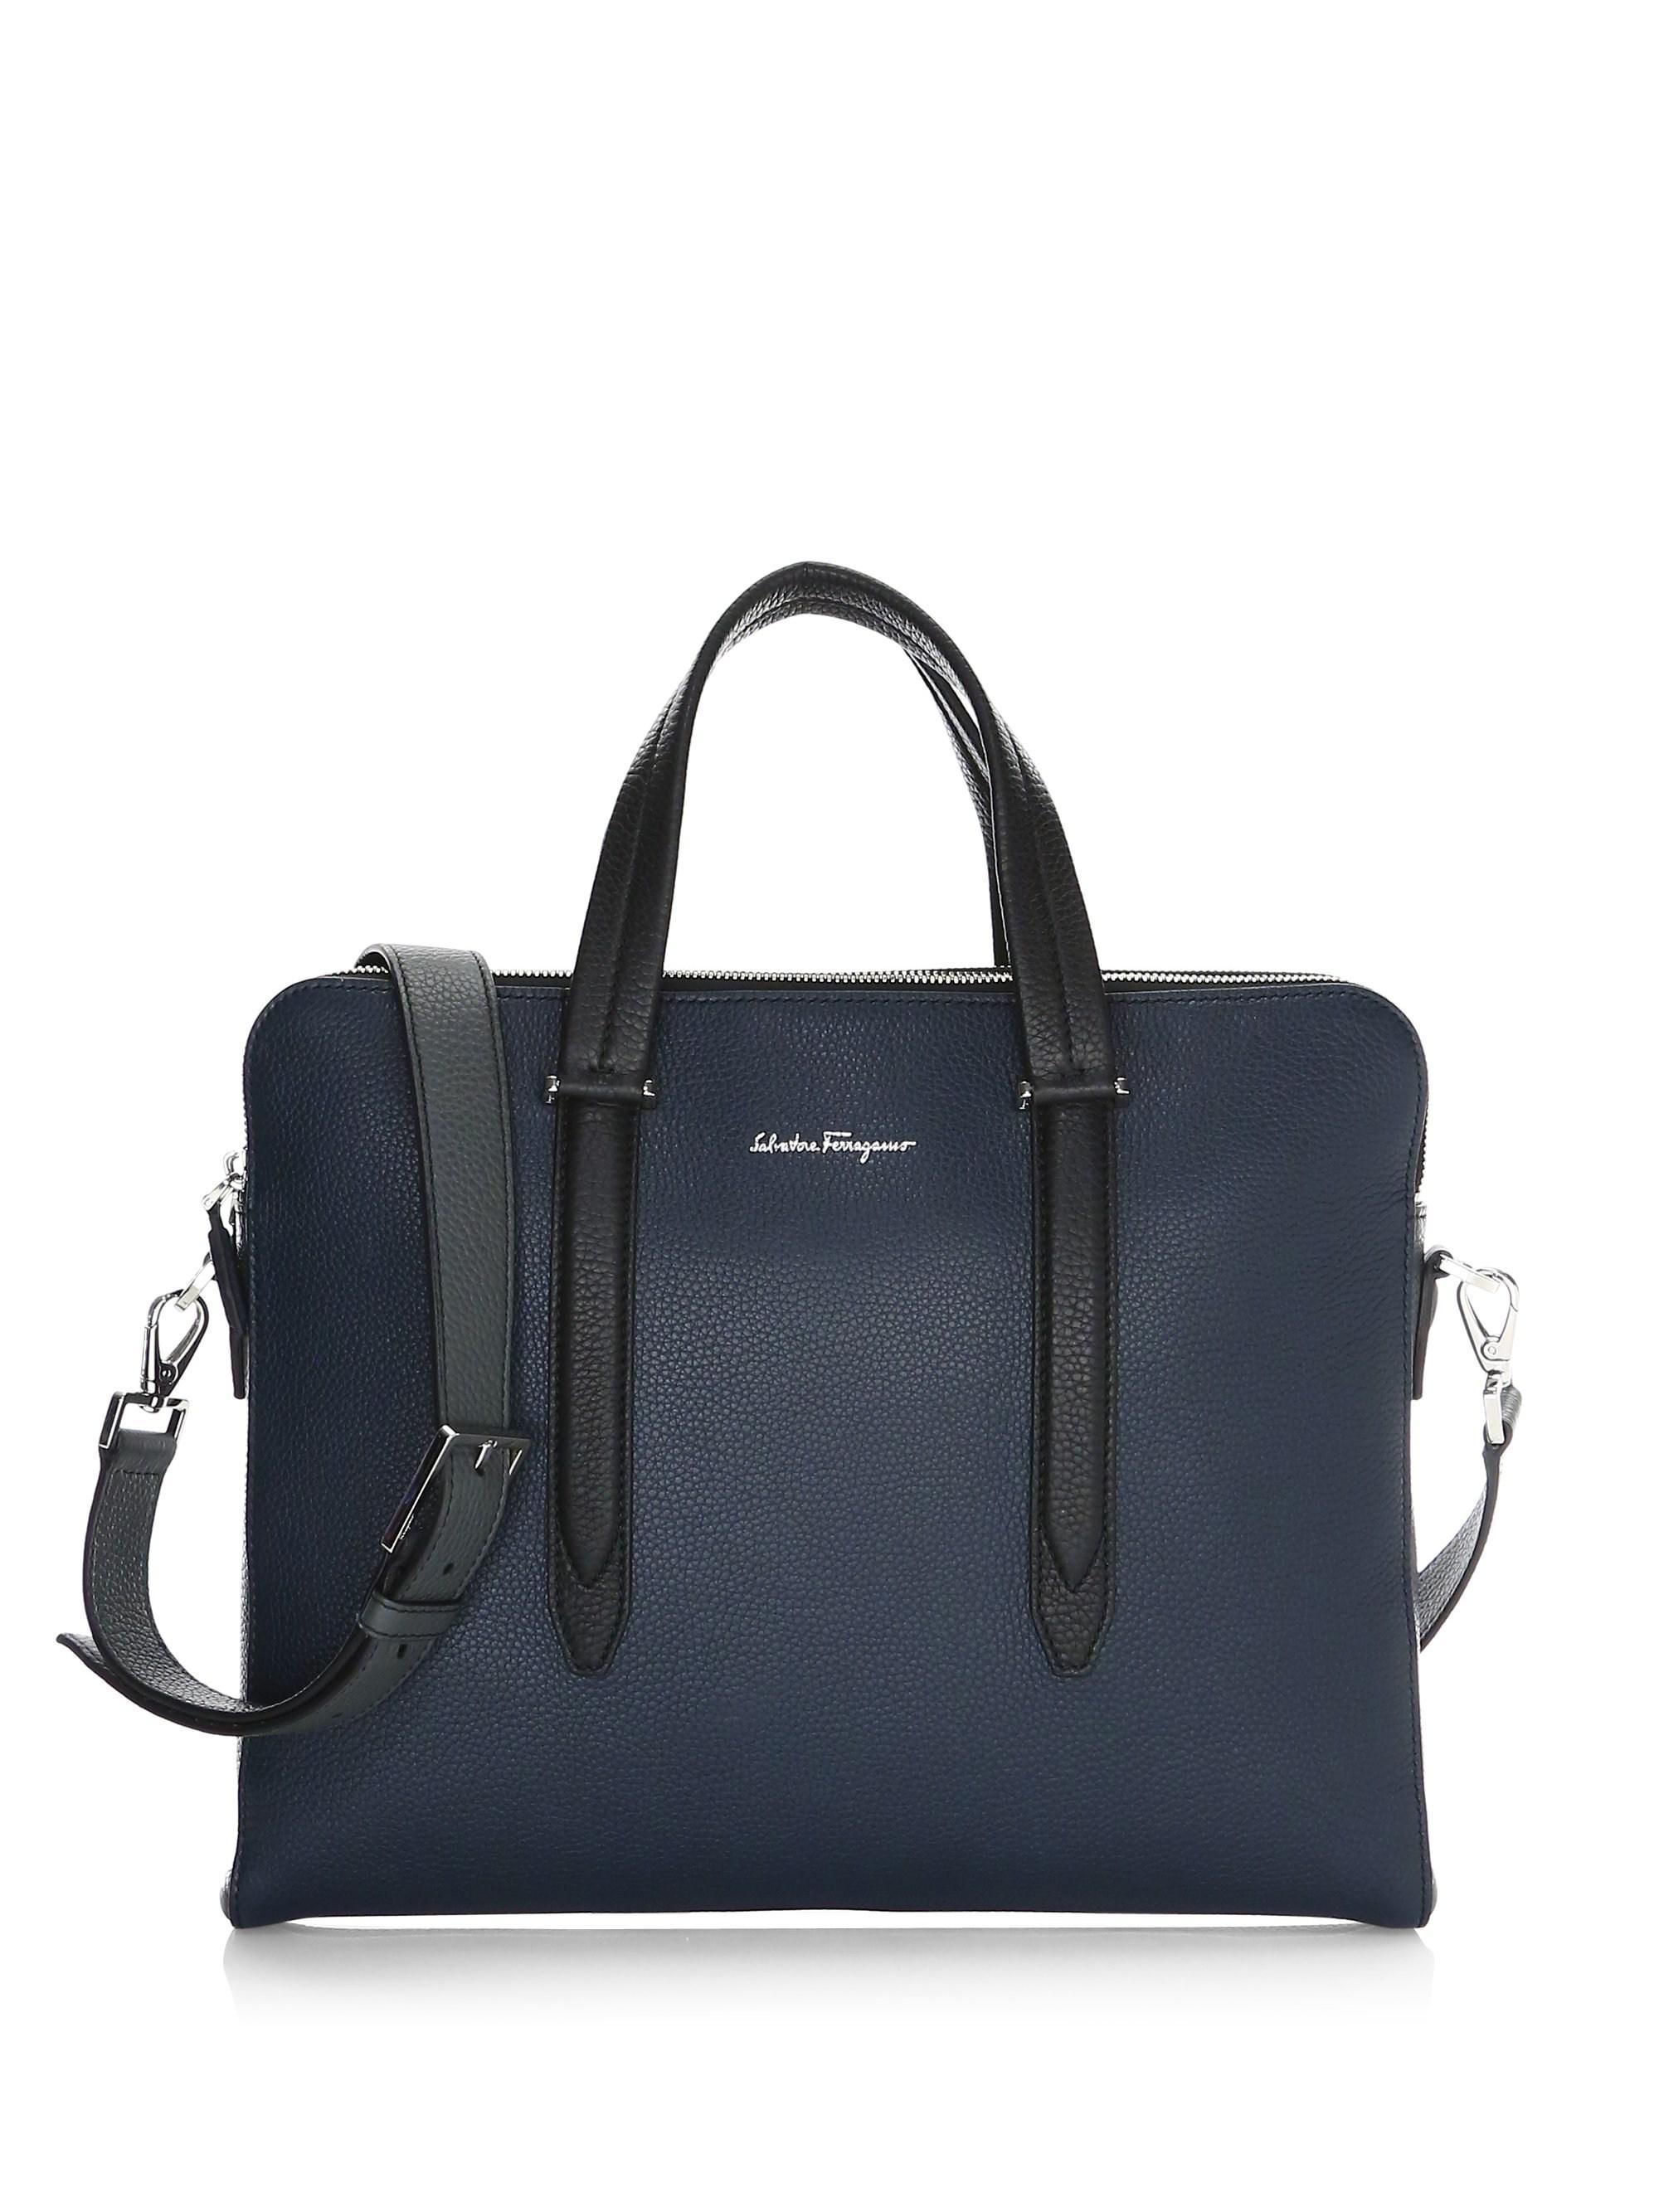 Ferragamo Pebbled-leather Laptop Bag in Black for Men - Lyst 2b478d857b884